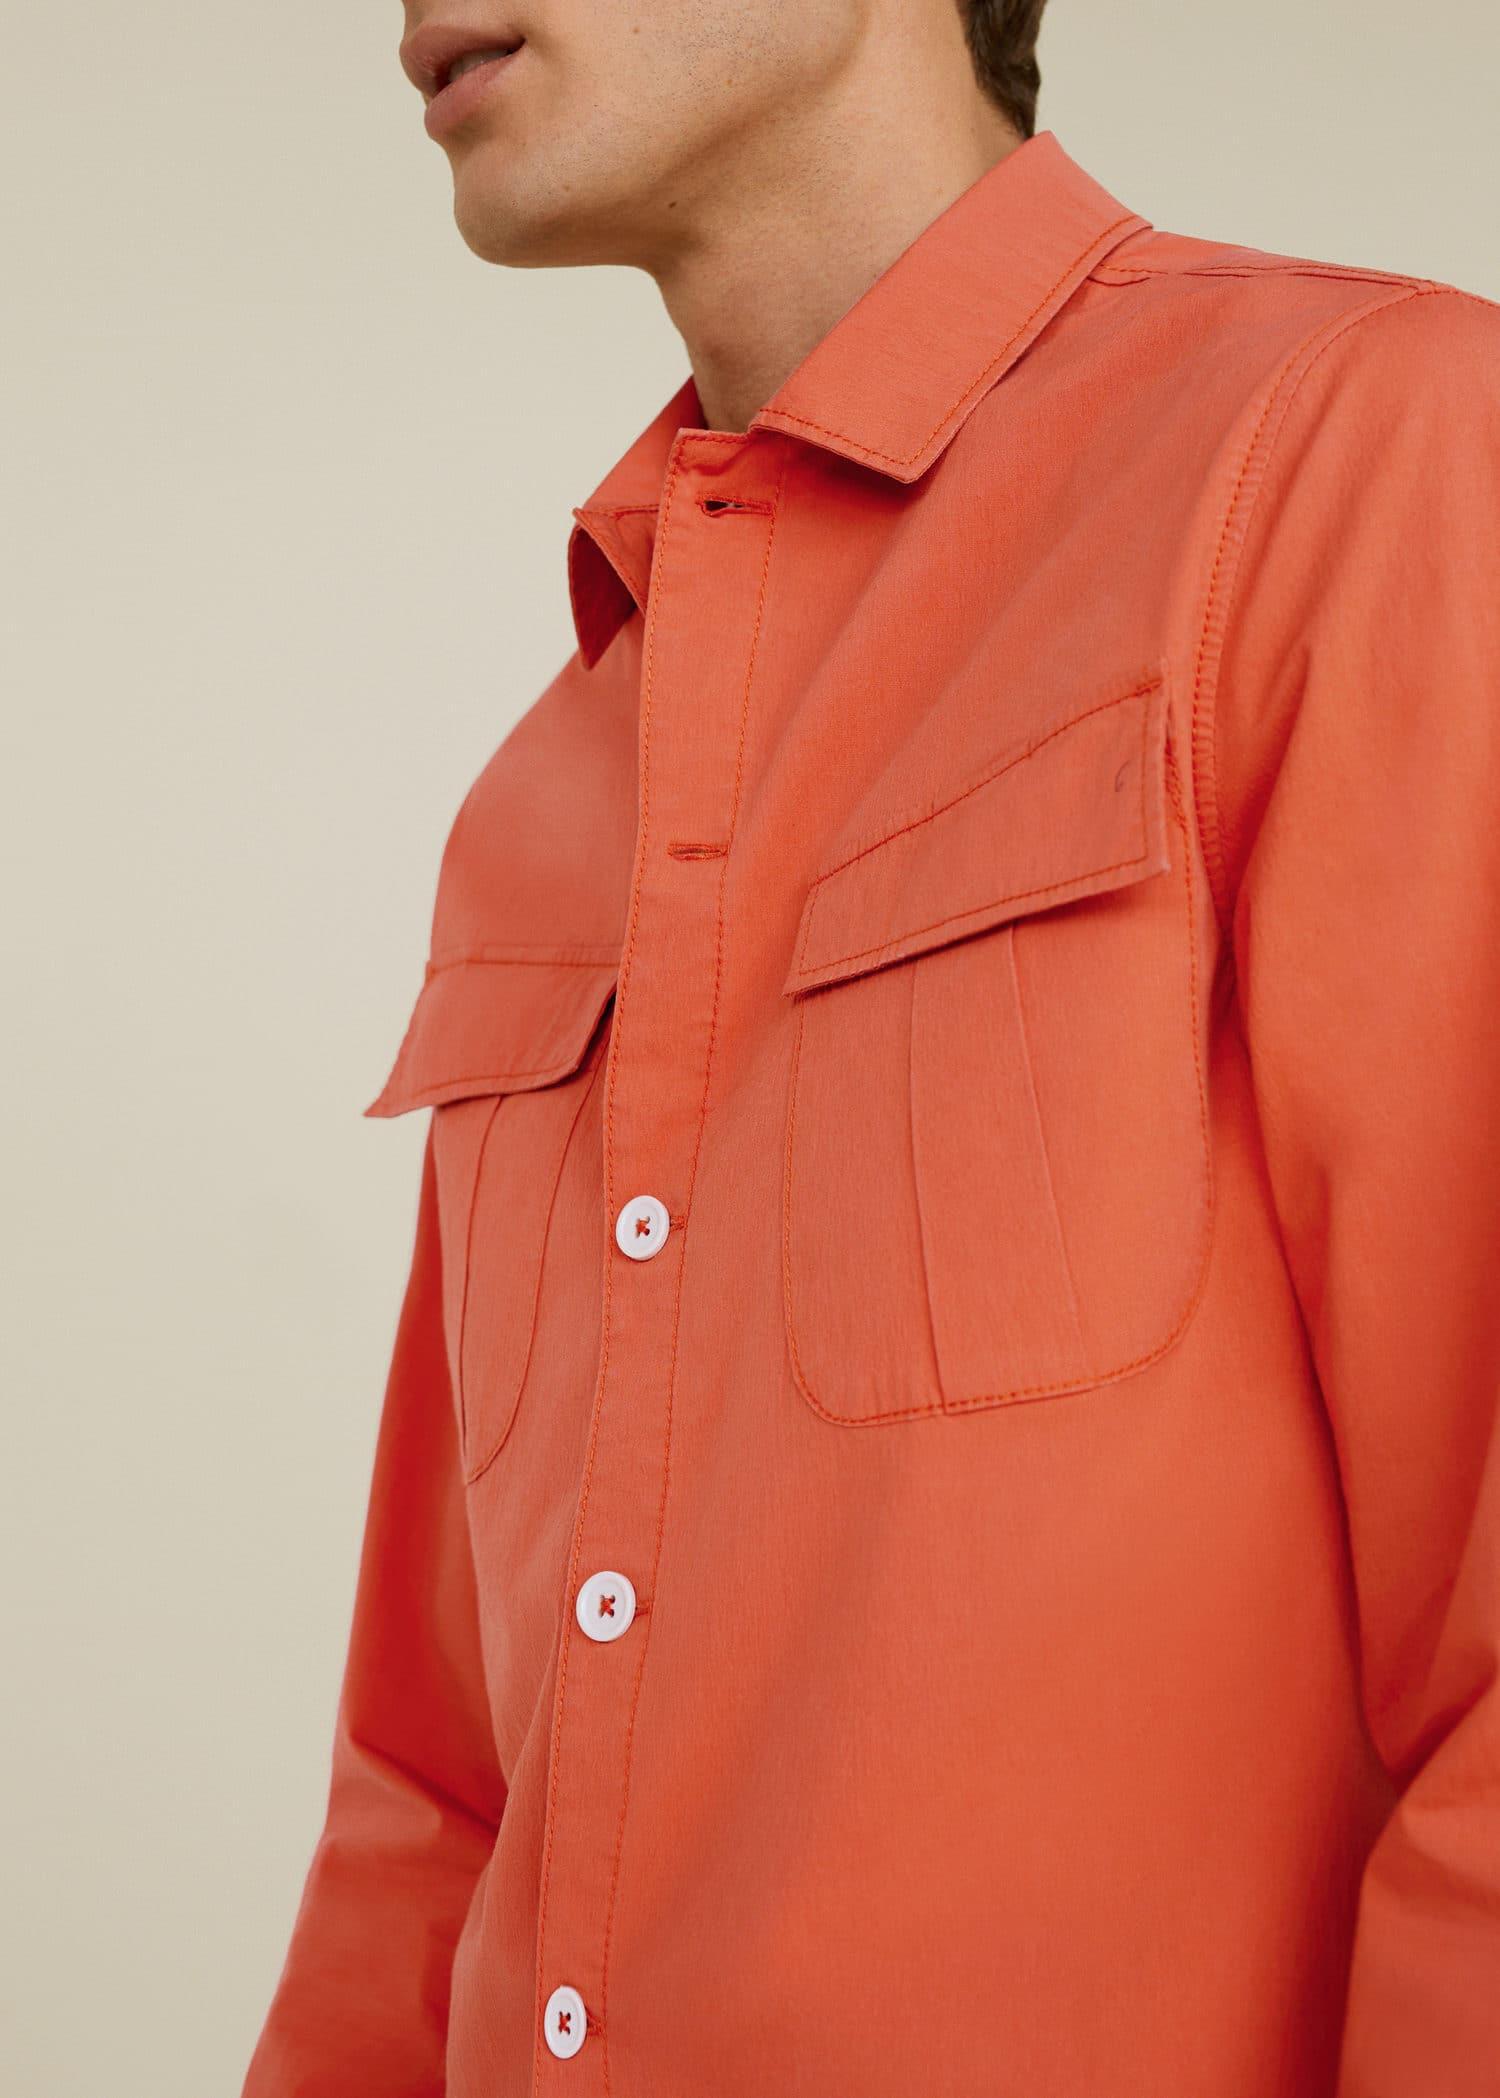 9b7a1a360a8dd Modalite - Mango Göğsü cepli koton gömlek ceket